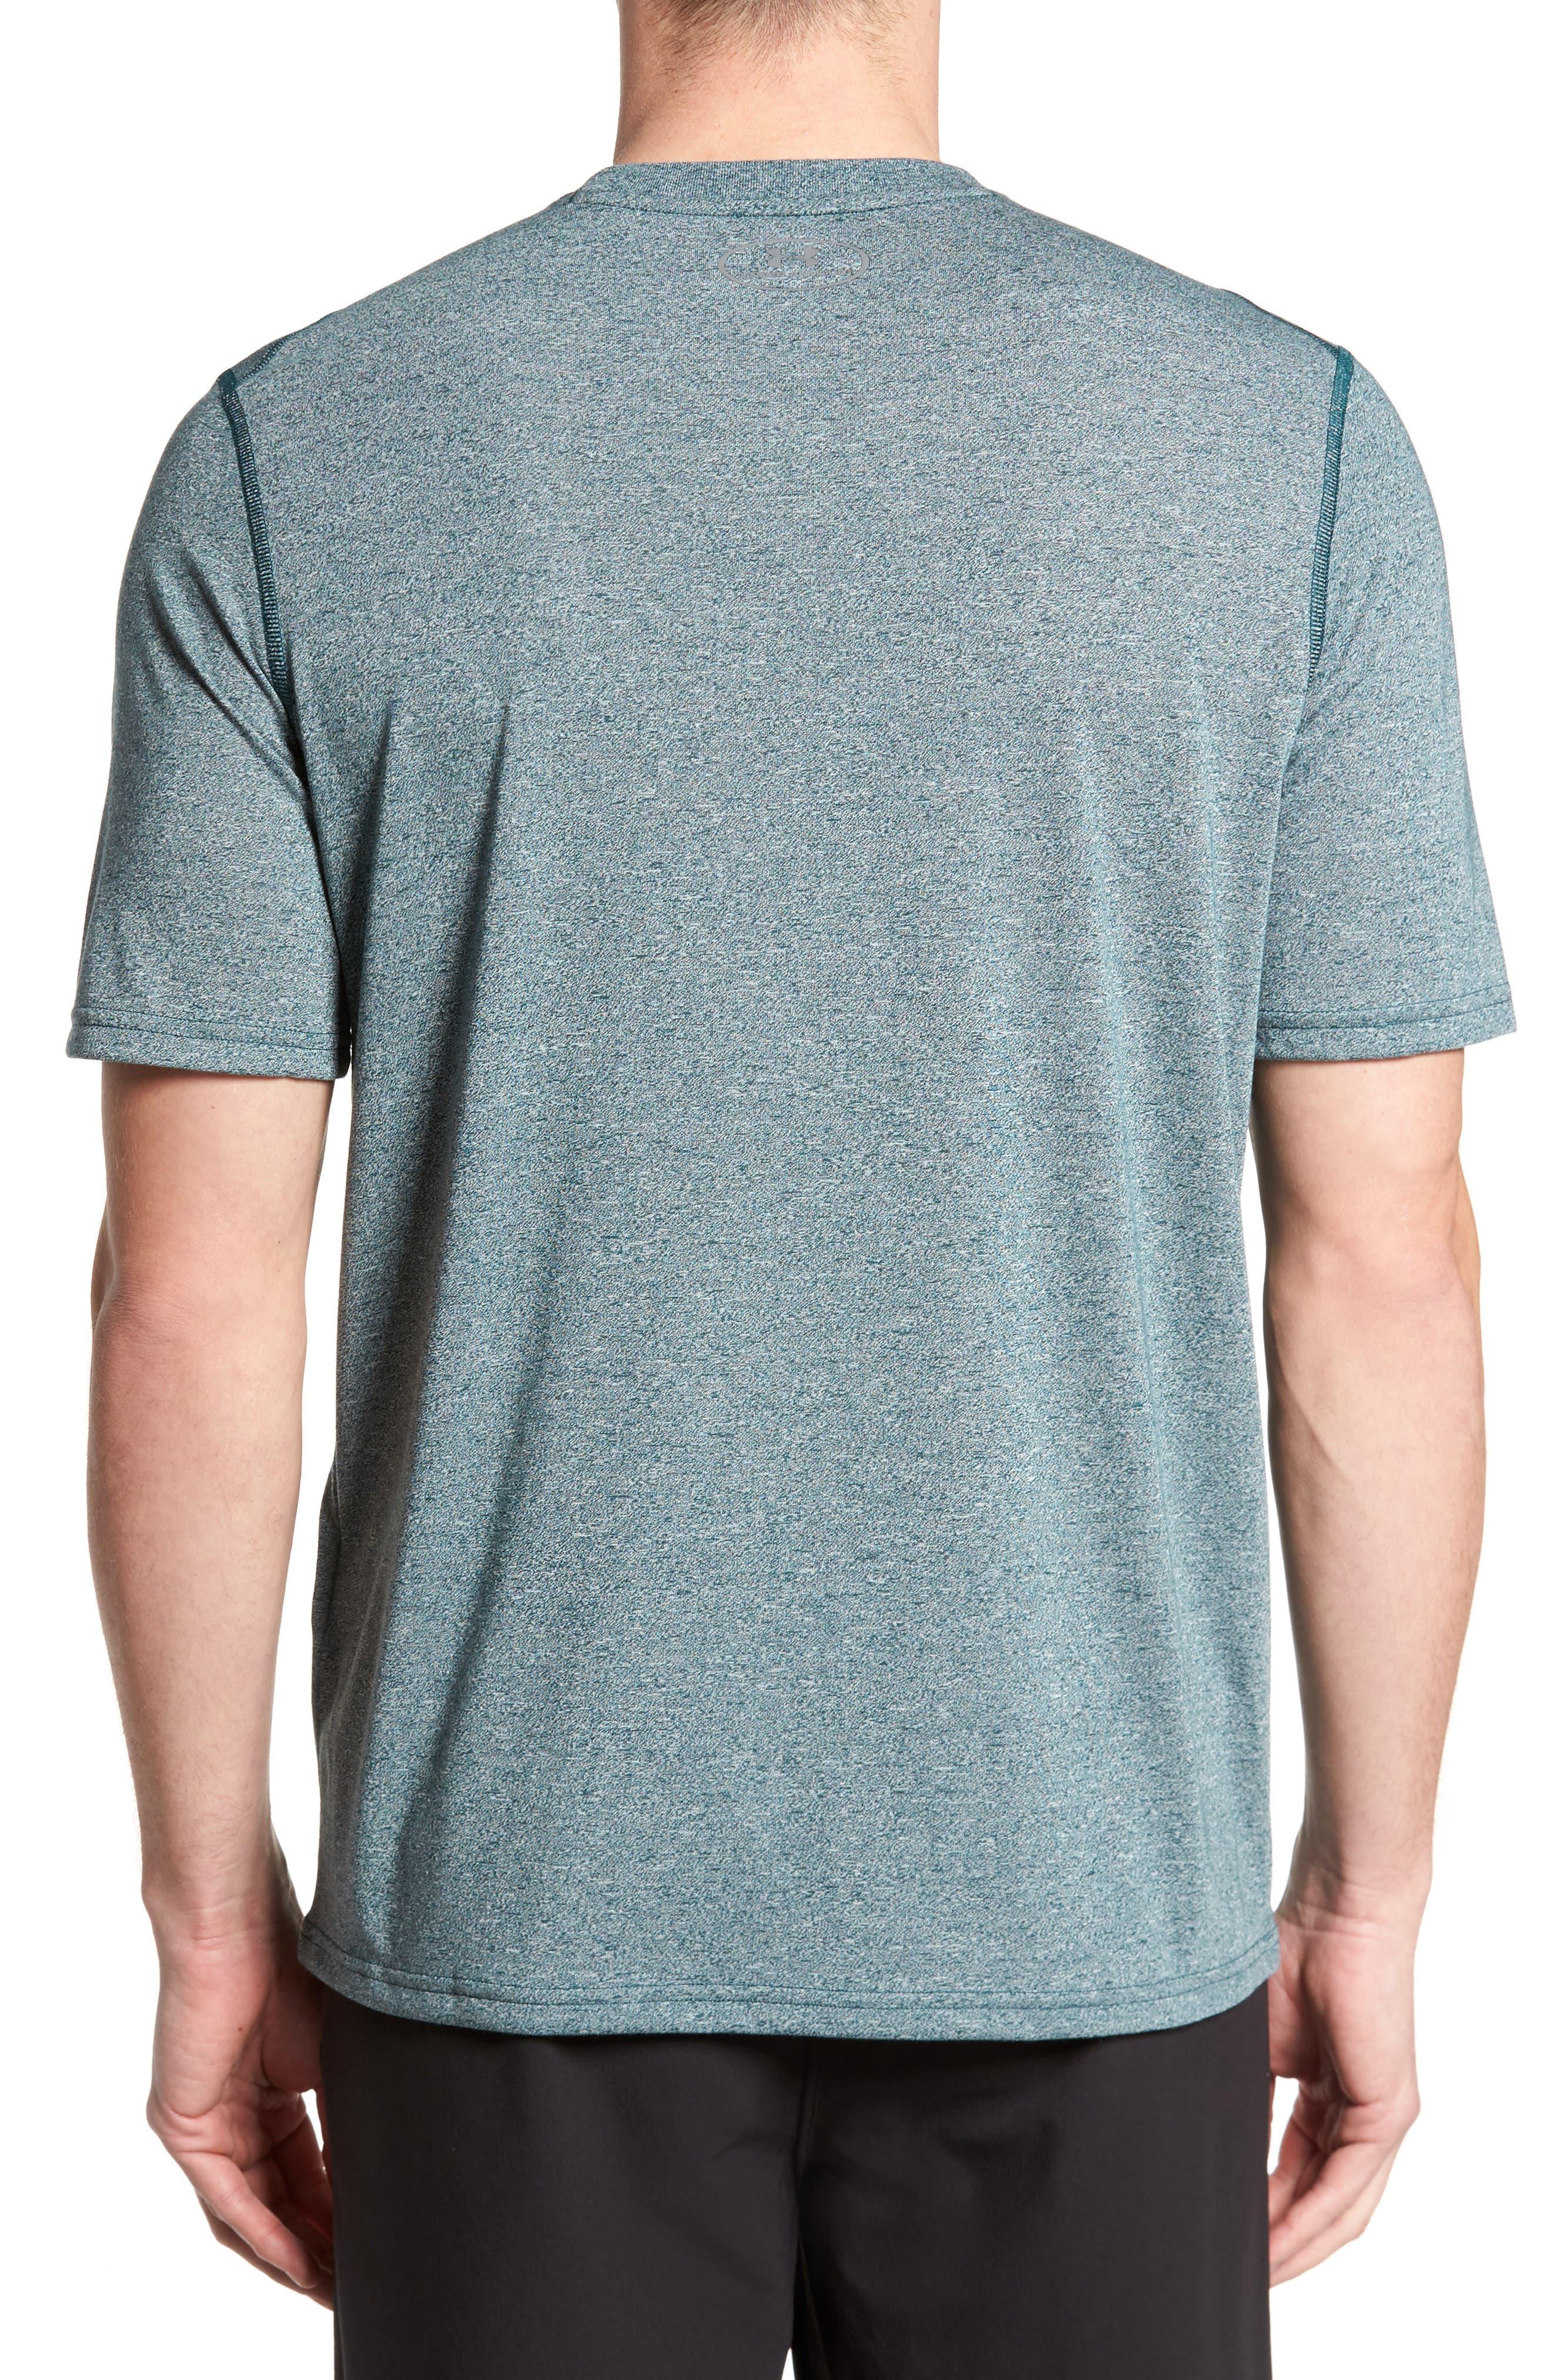 Regular Fit Threadborne T-Shirt,                             Alternate thumbnail 2, color,                             300